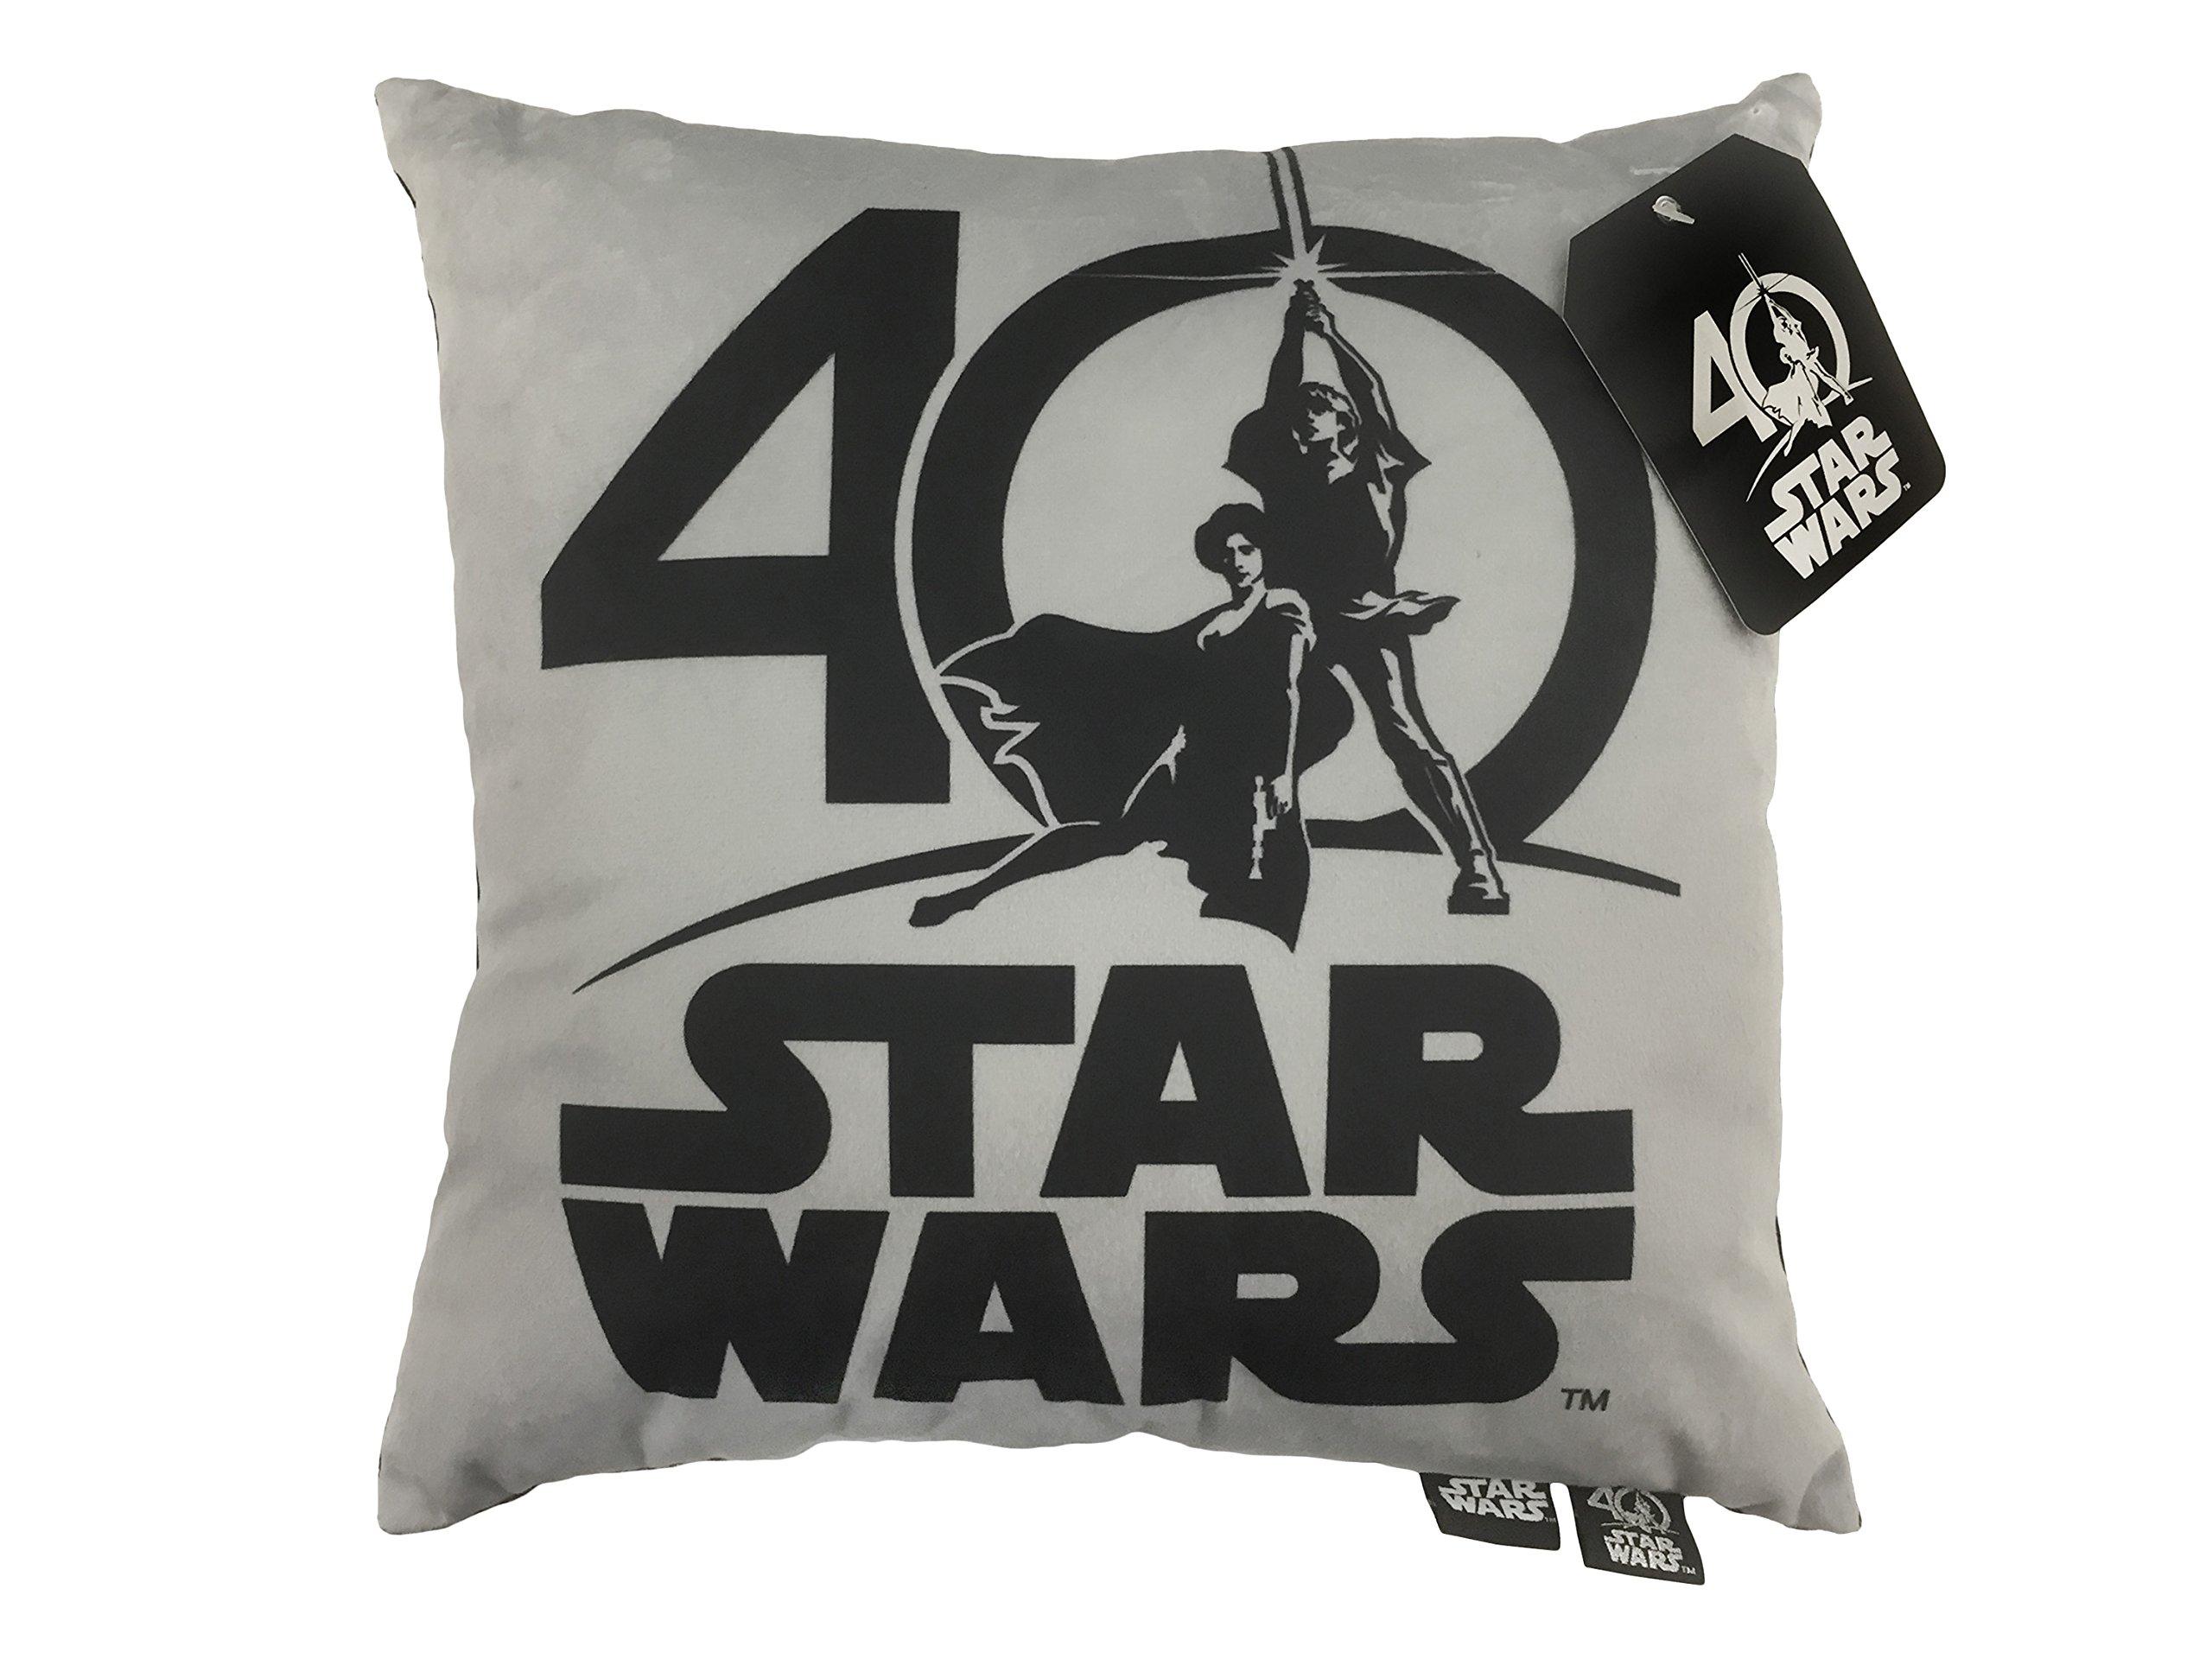 Star Wars 40th Logo Decorative Toss Throw Pillow, Gray